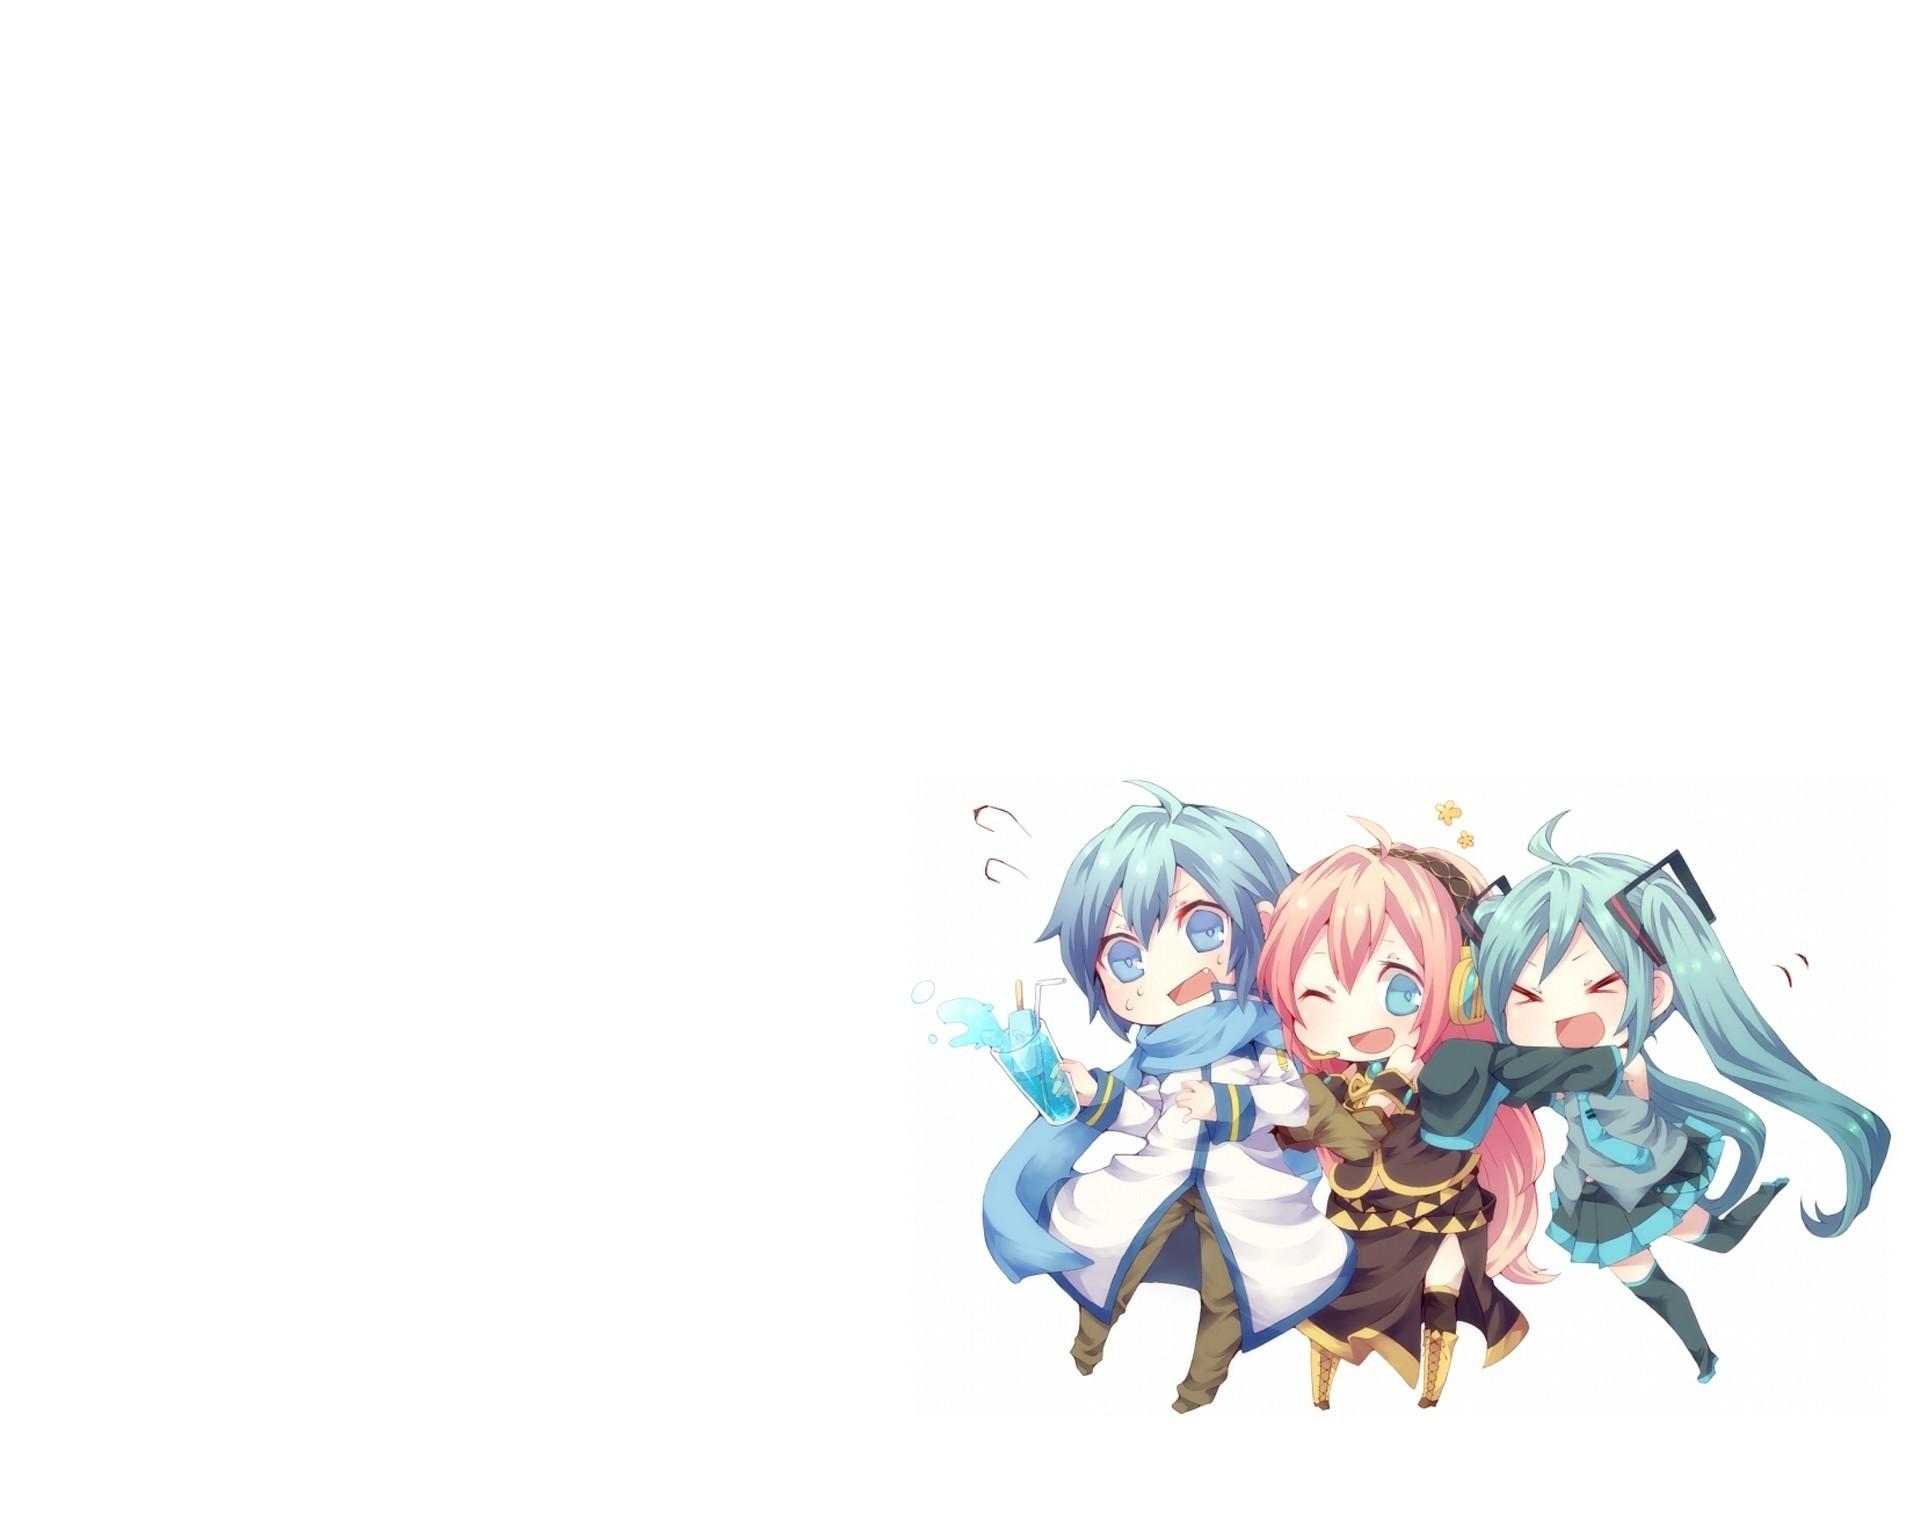 Unduh 65 Wallpaper Anime Chibi Hd HD Paling Keren